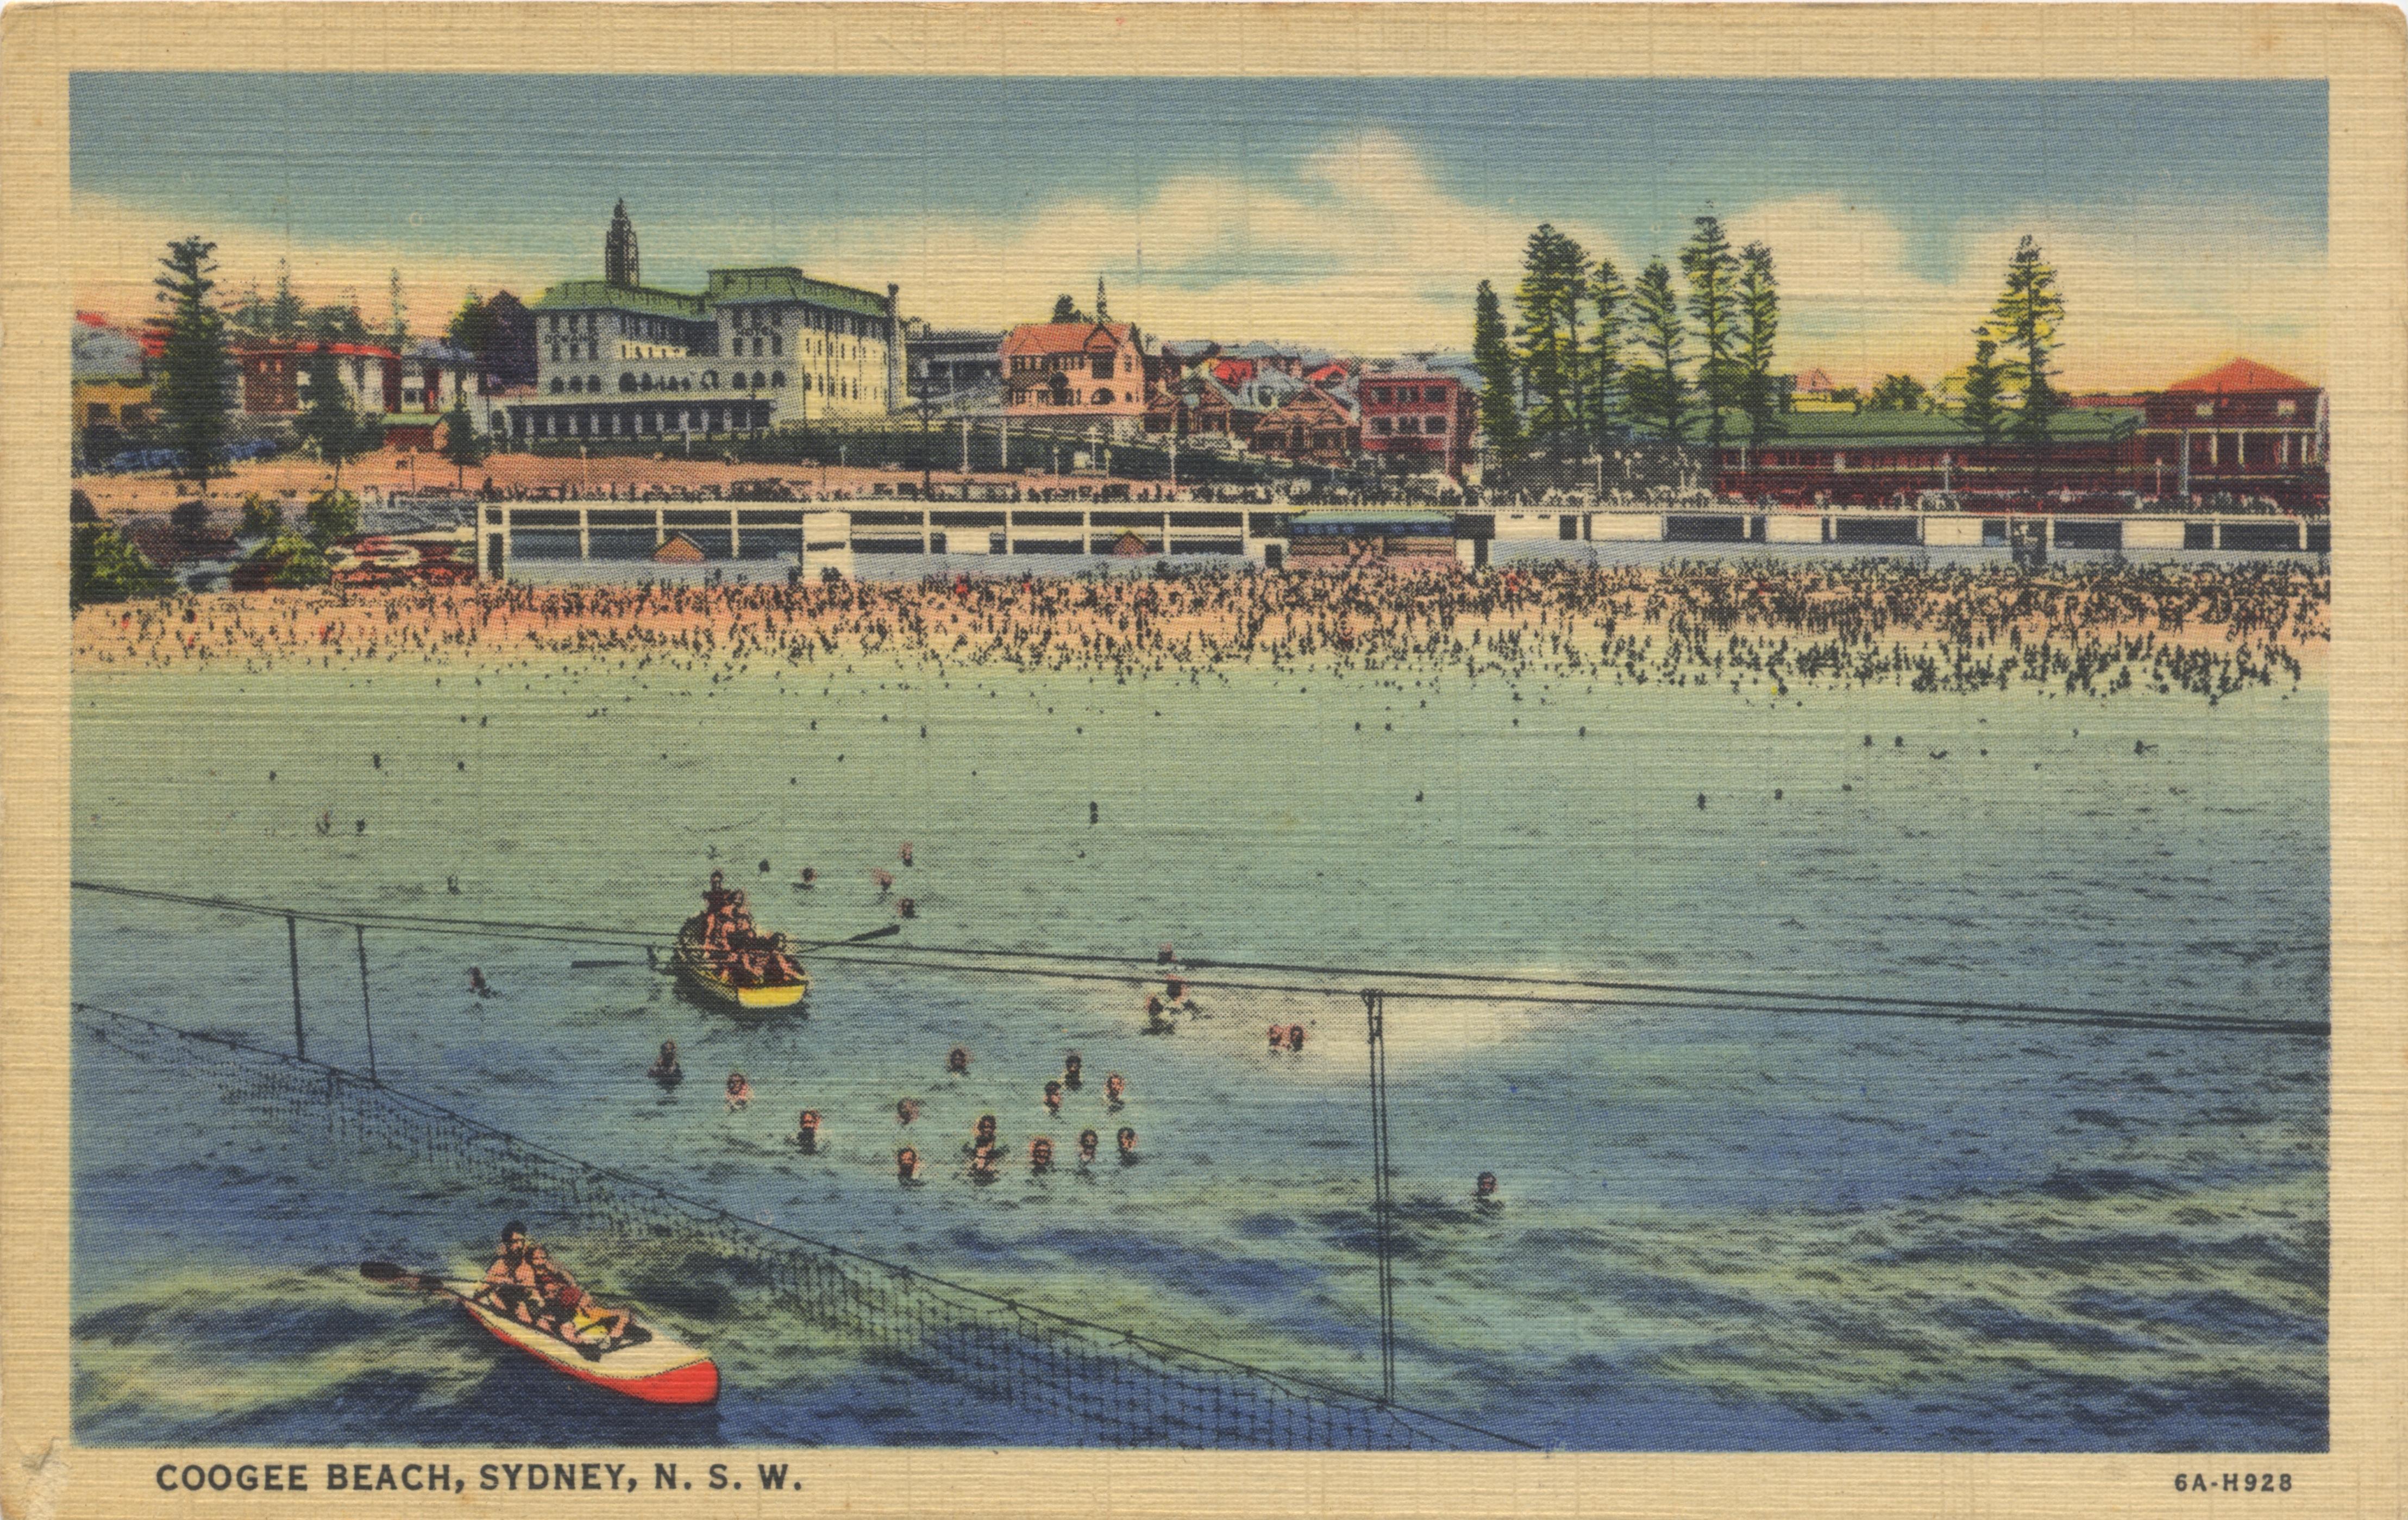 1. Coogee Beach, Sydney, NSW